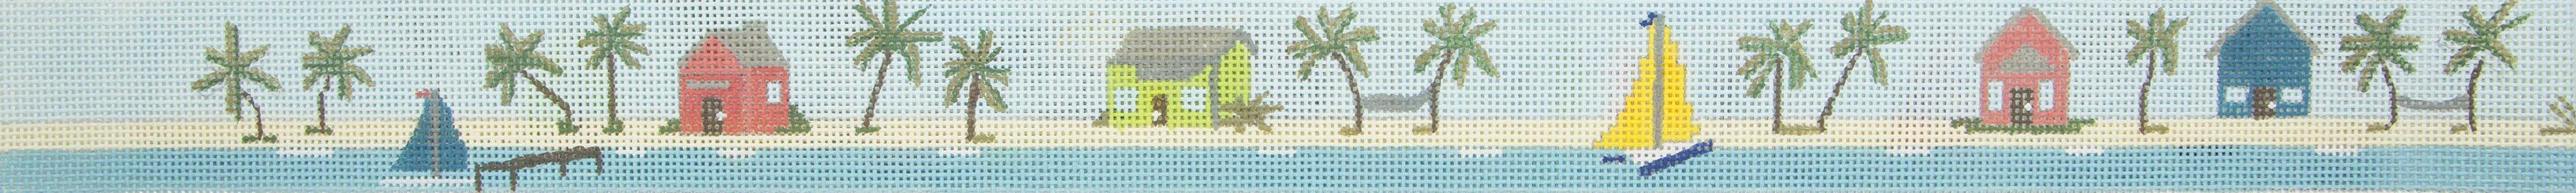 PP1102 Tropical Island Scene Belt Purple Palm